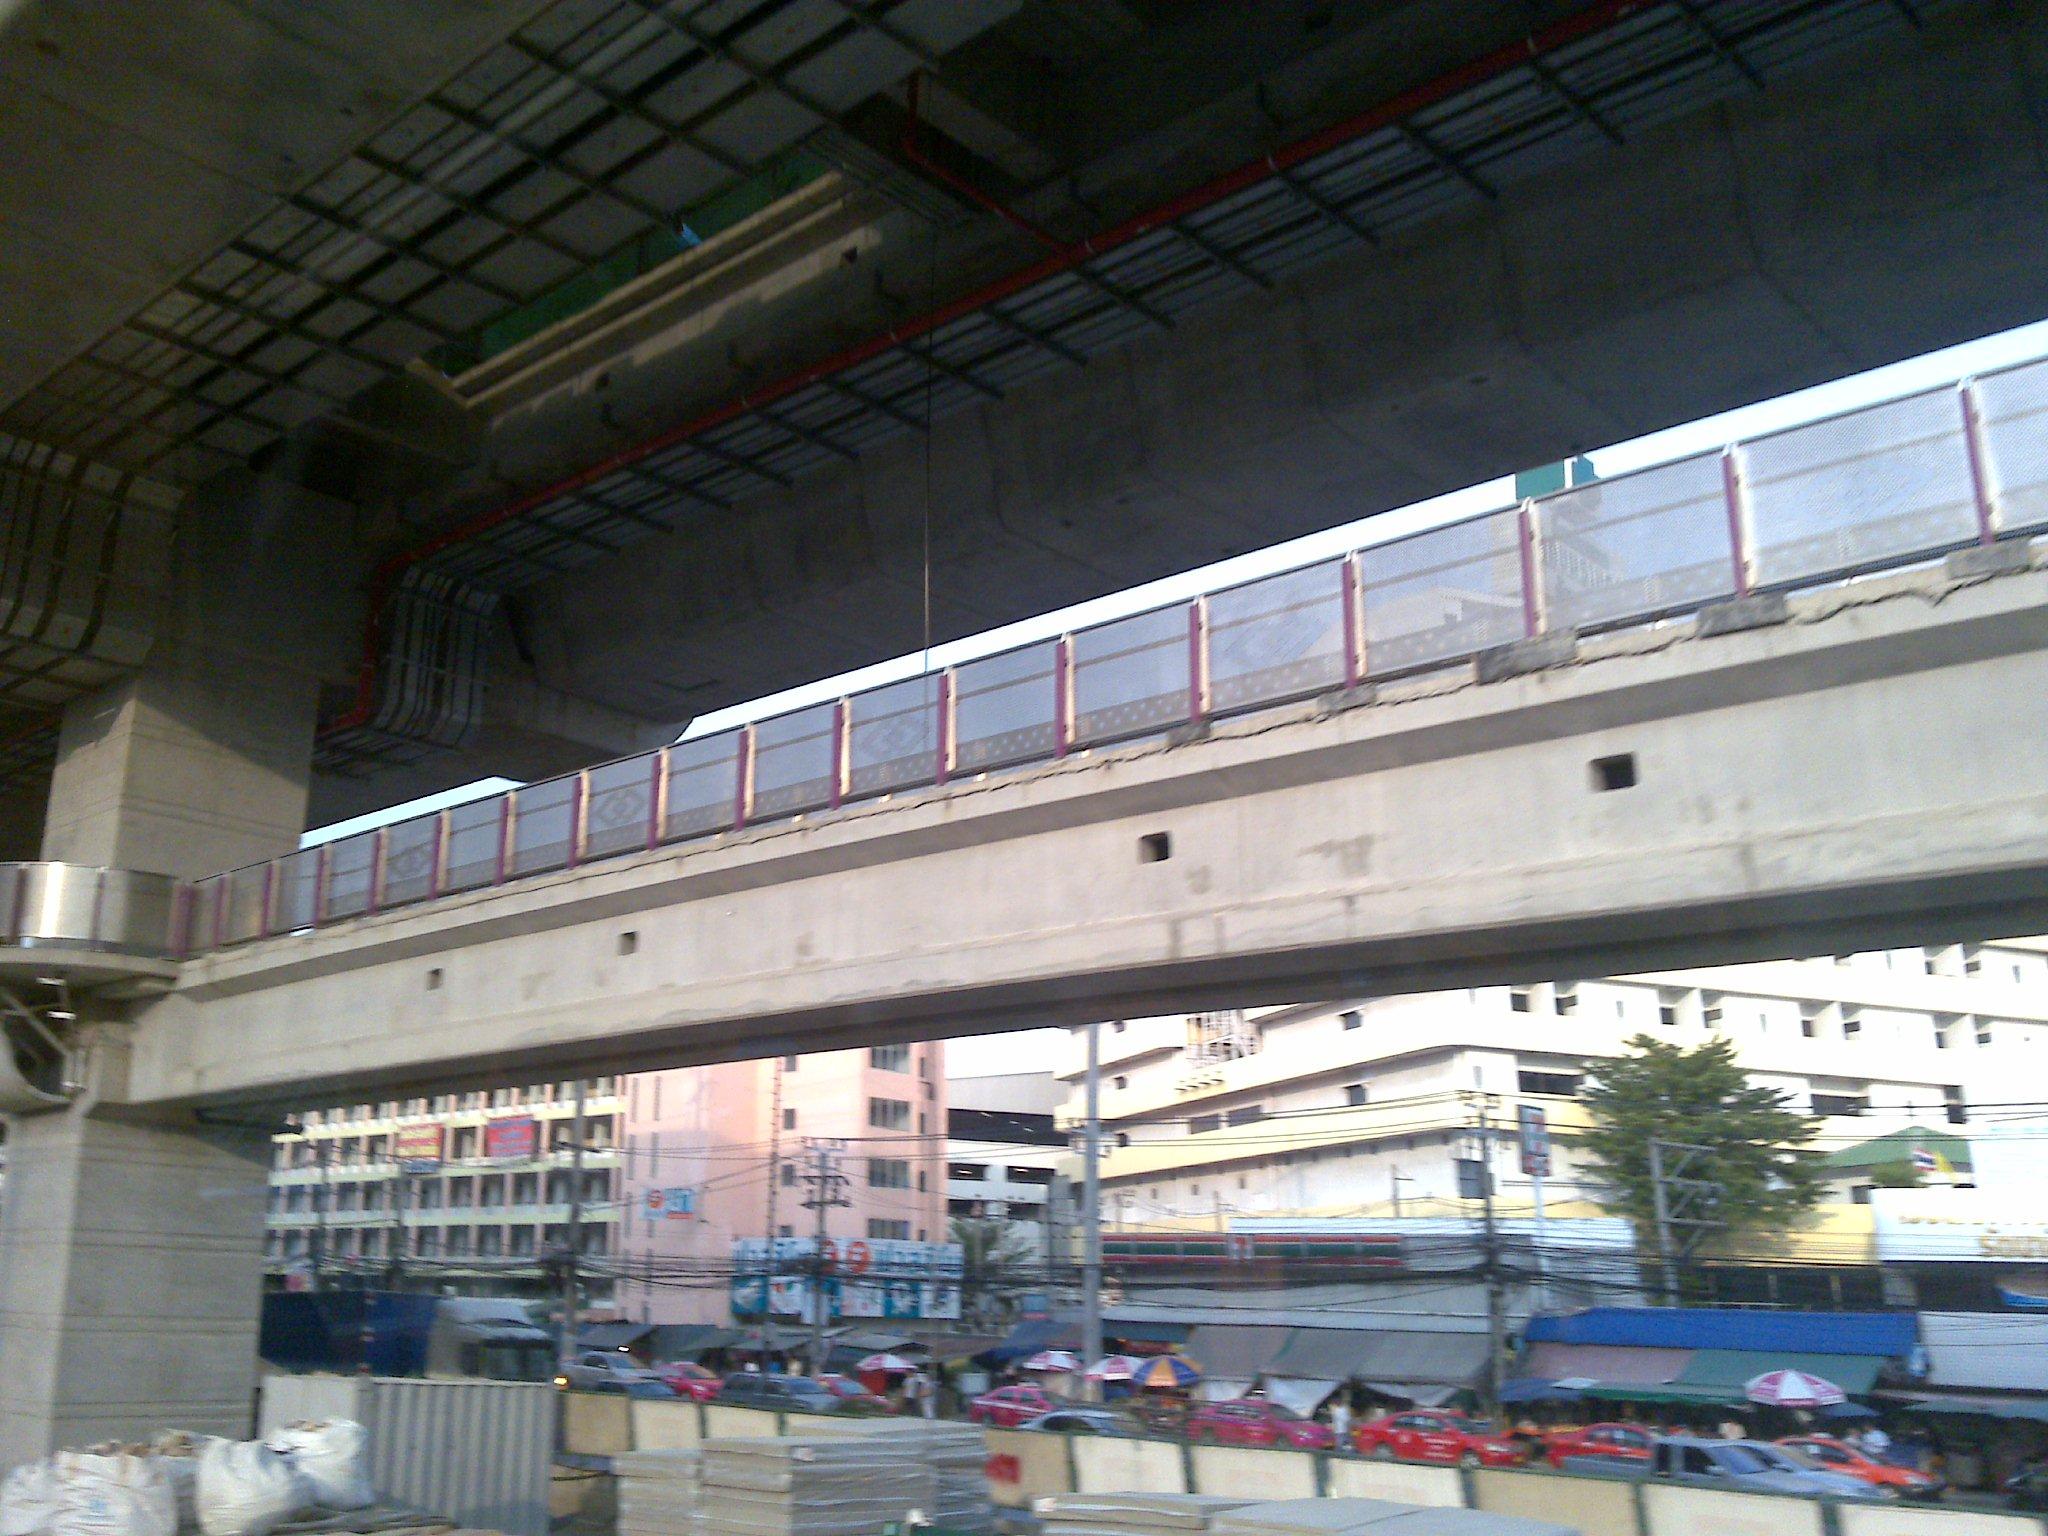 Mrt Purple Line Bangkok File:mrt Purple Line Under